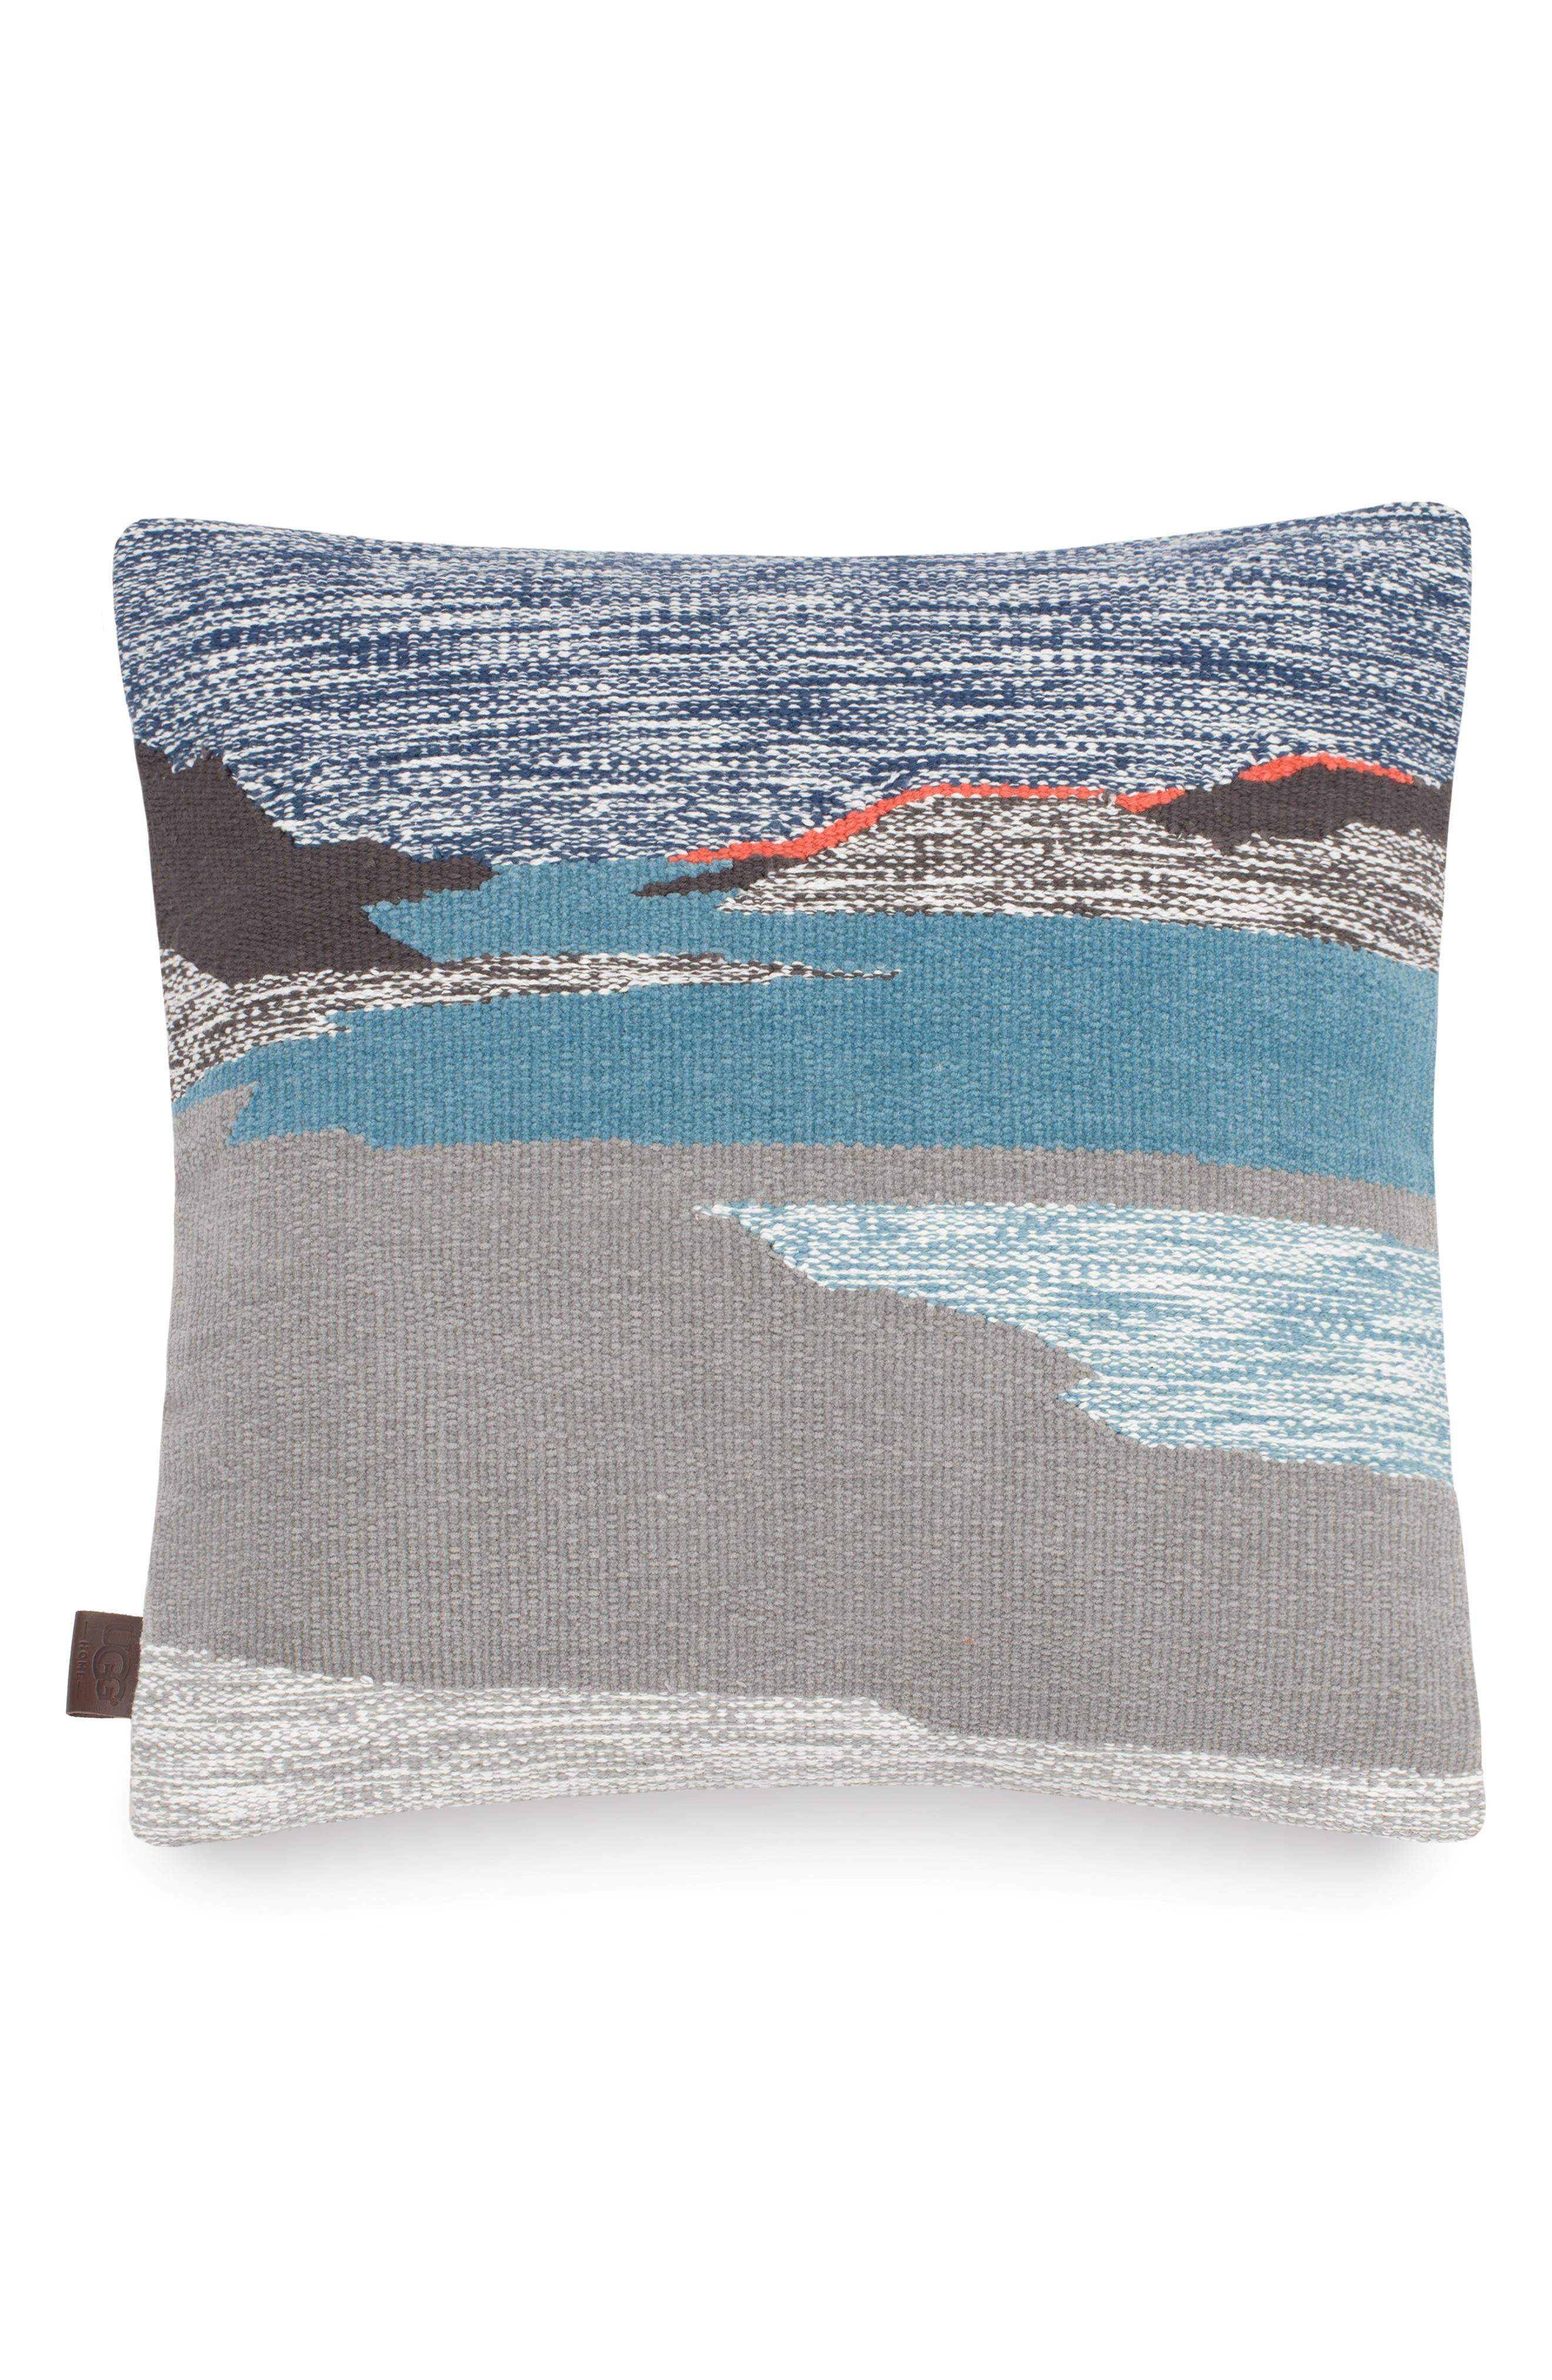 Daydream Landscape Accent Pillow,                         Main,                         color, Grey Multi